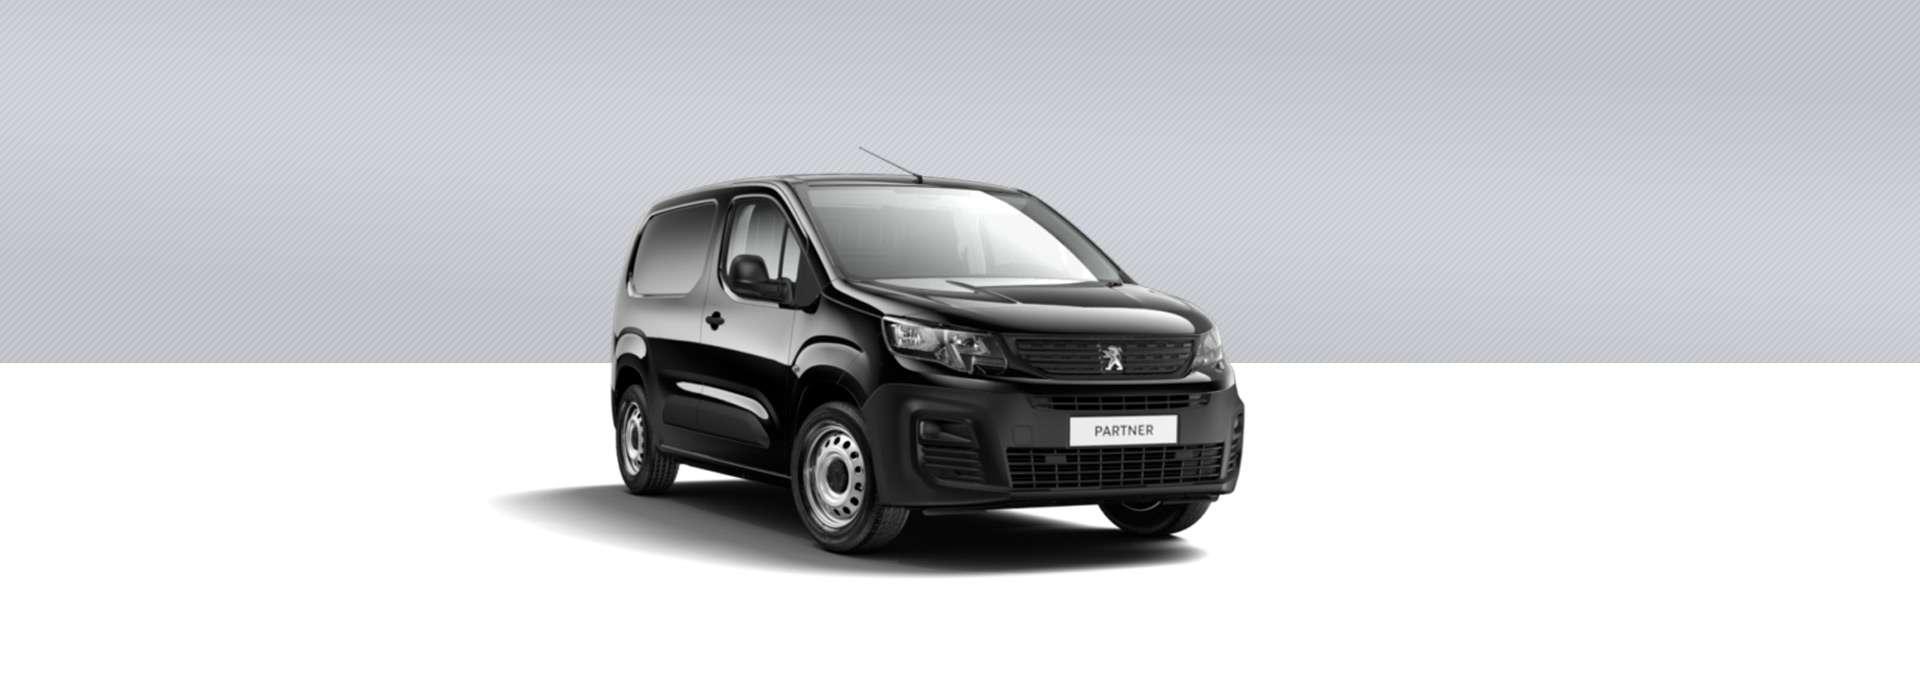 Peugeot Nuevo Partner Furgón